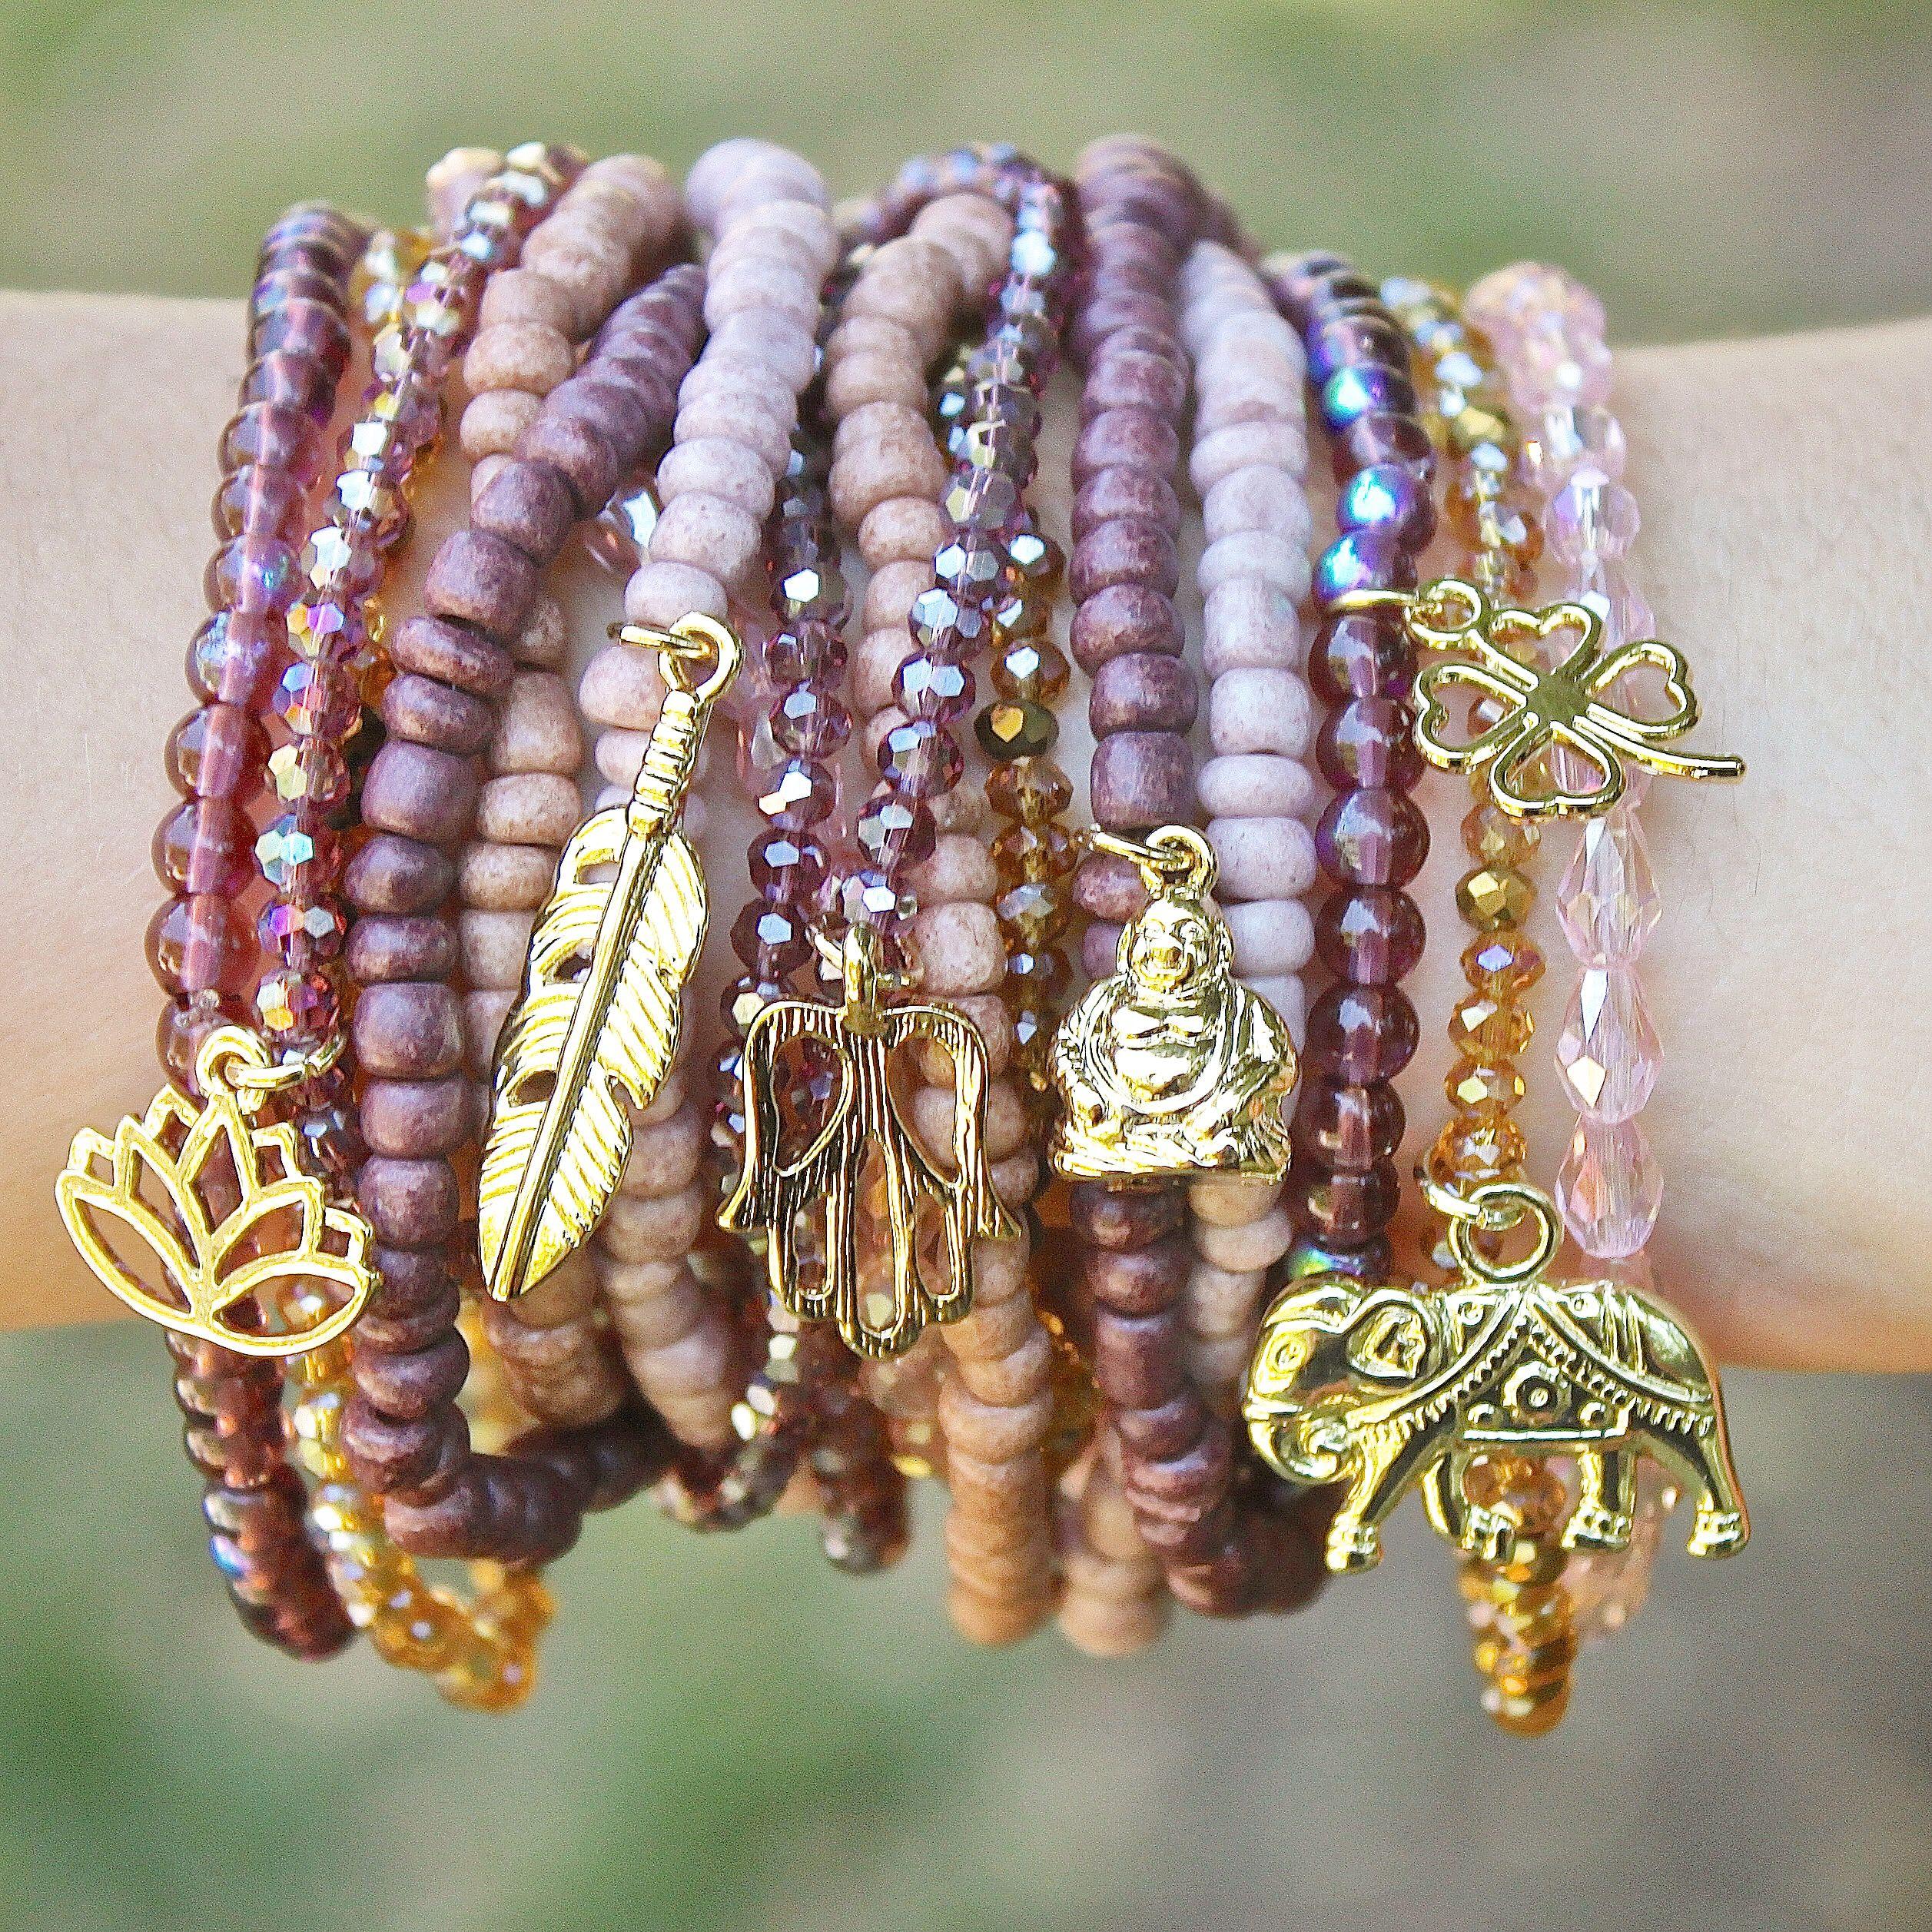 bohemian boho charm bracelets style pinterest armb nder schmuck armband und perlenkette. Black Bedroom Furniture Sets. Home Design Ideas